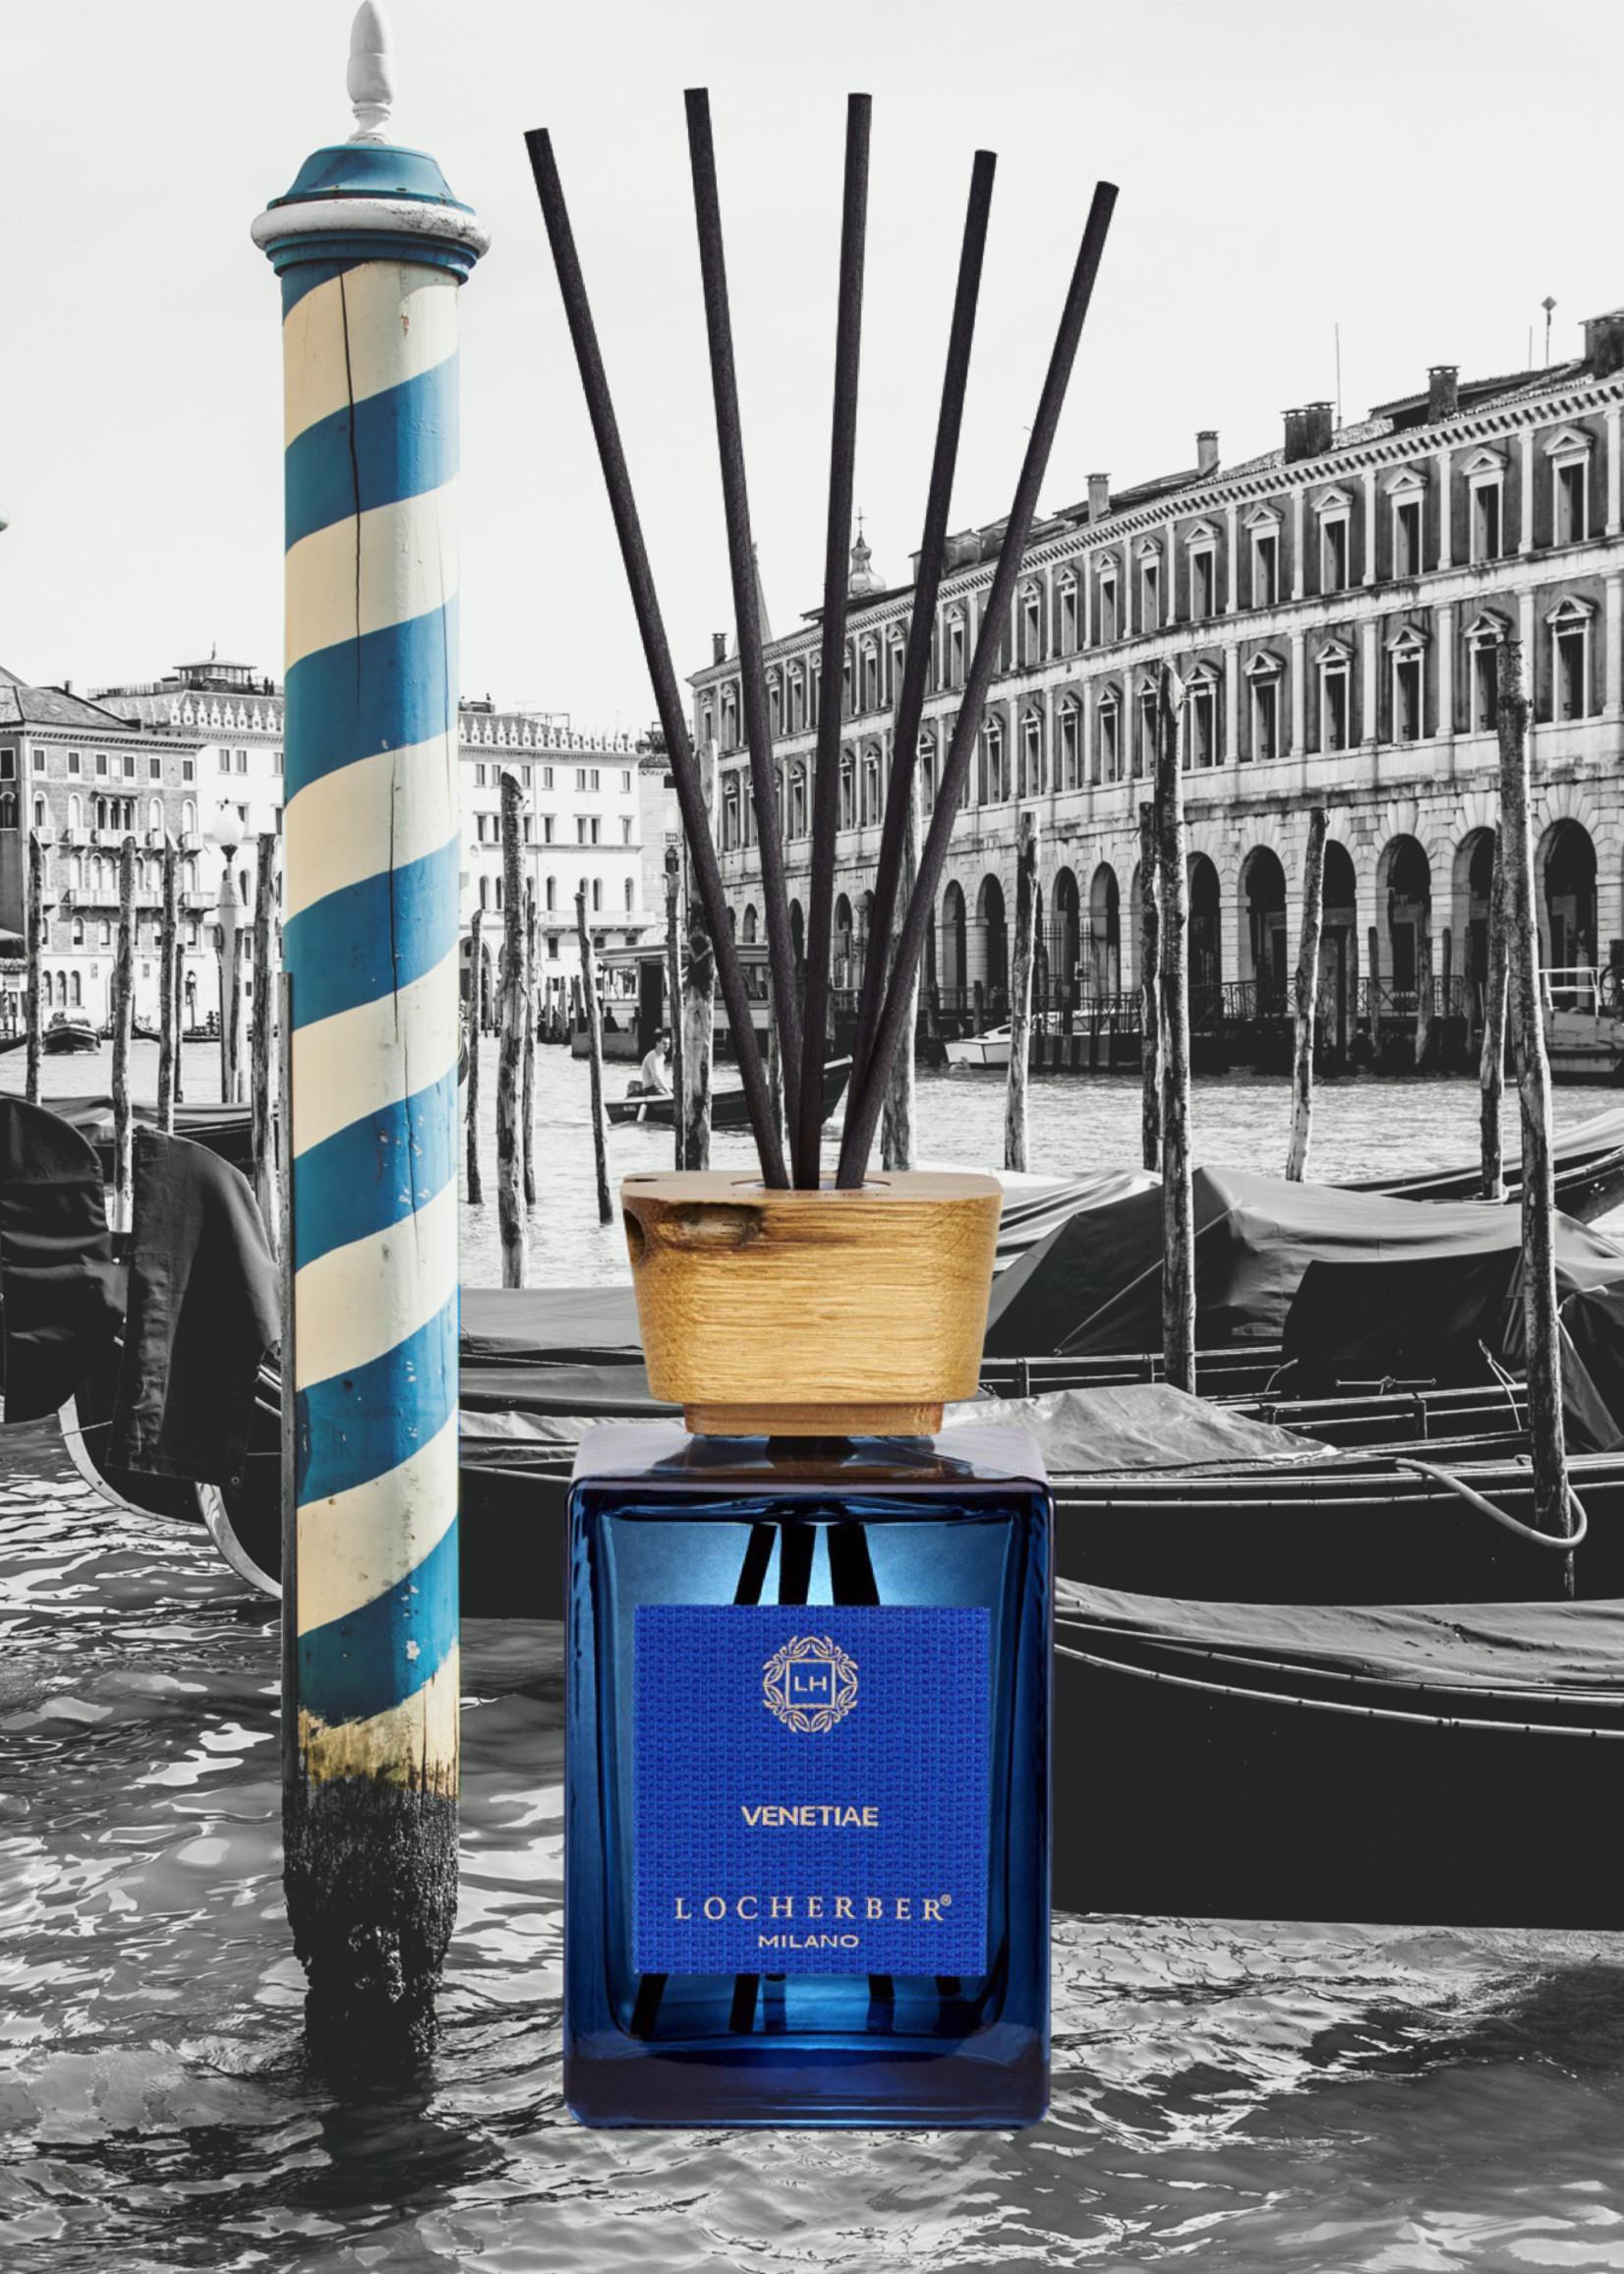 Locherber Locherber Milano - Venetiae - Diffuser Cadeau Set